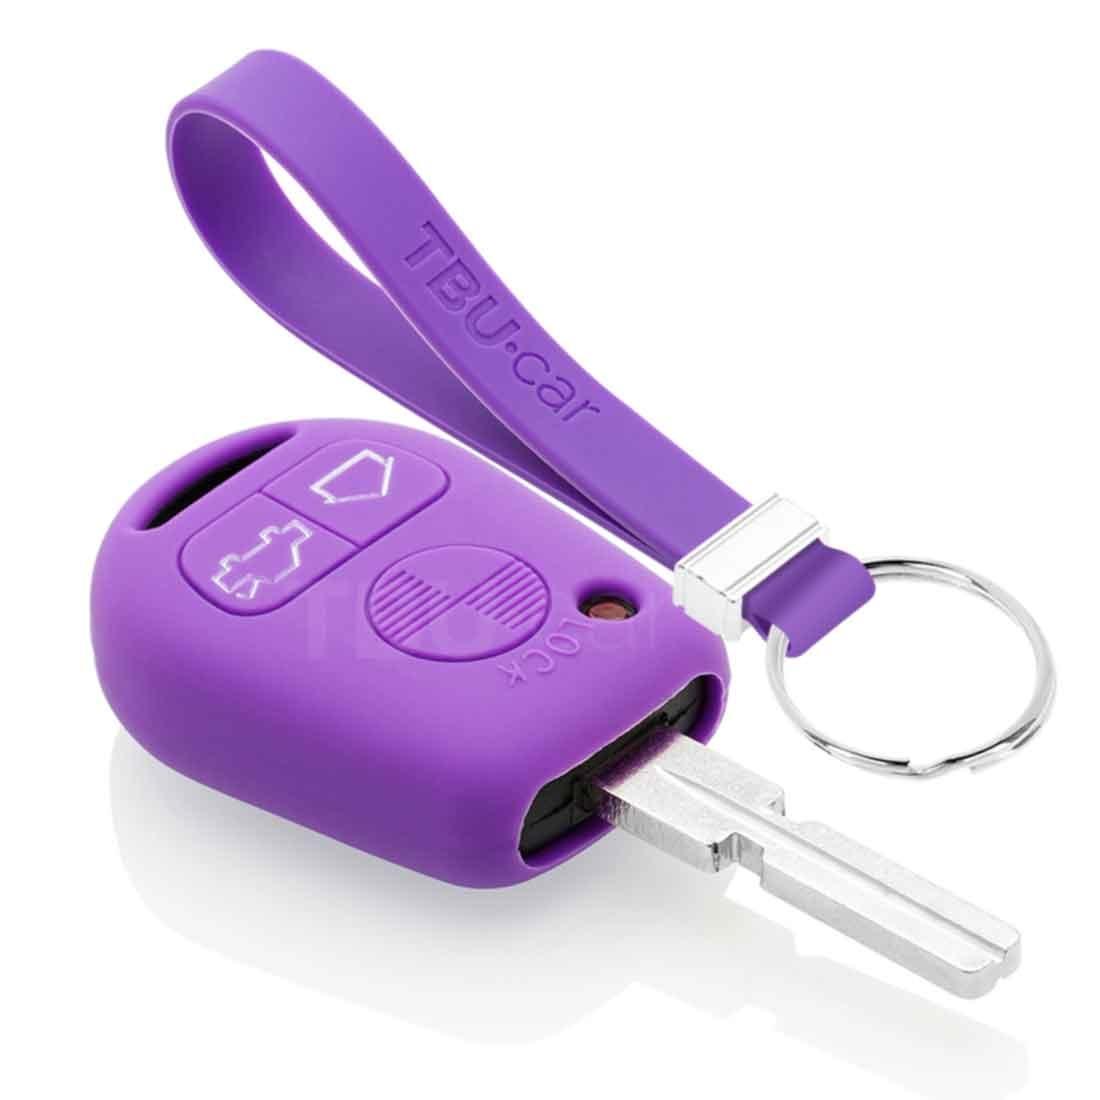 TBU car TBU car Sleutel cover compatibel met BMW - Silicone sleutelhoesje - beschermhoesje autosleutel - Paars